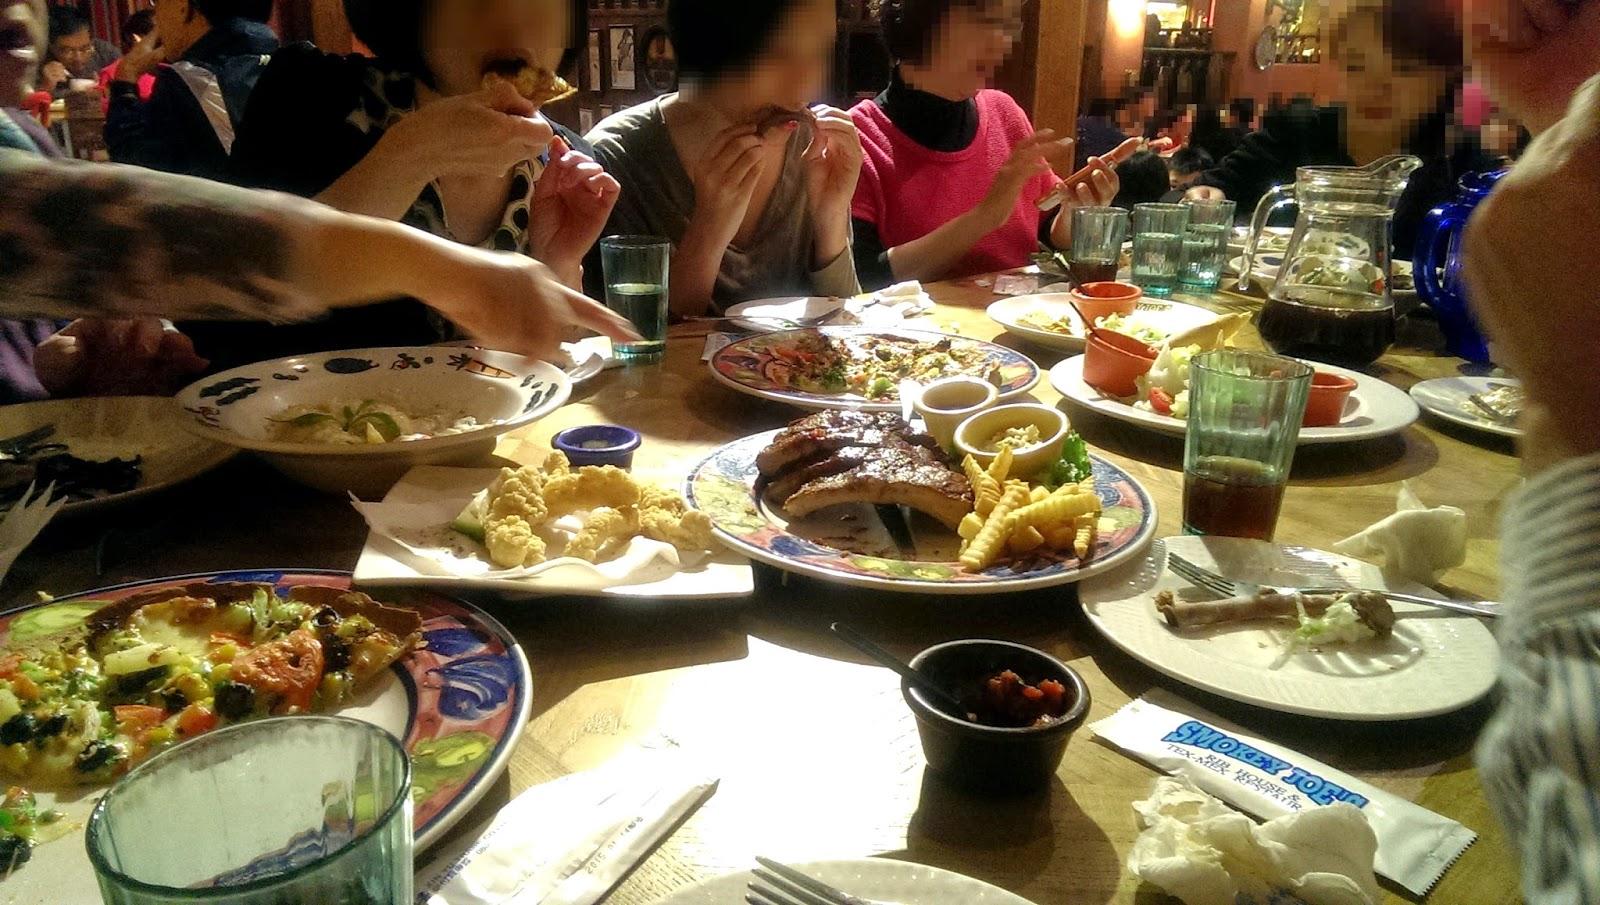 2015 01 24%2B19.14.56 - [食記] Smokey Joe's 冒煙的喬 高雄左營的美式墨西哥餐廳!